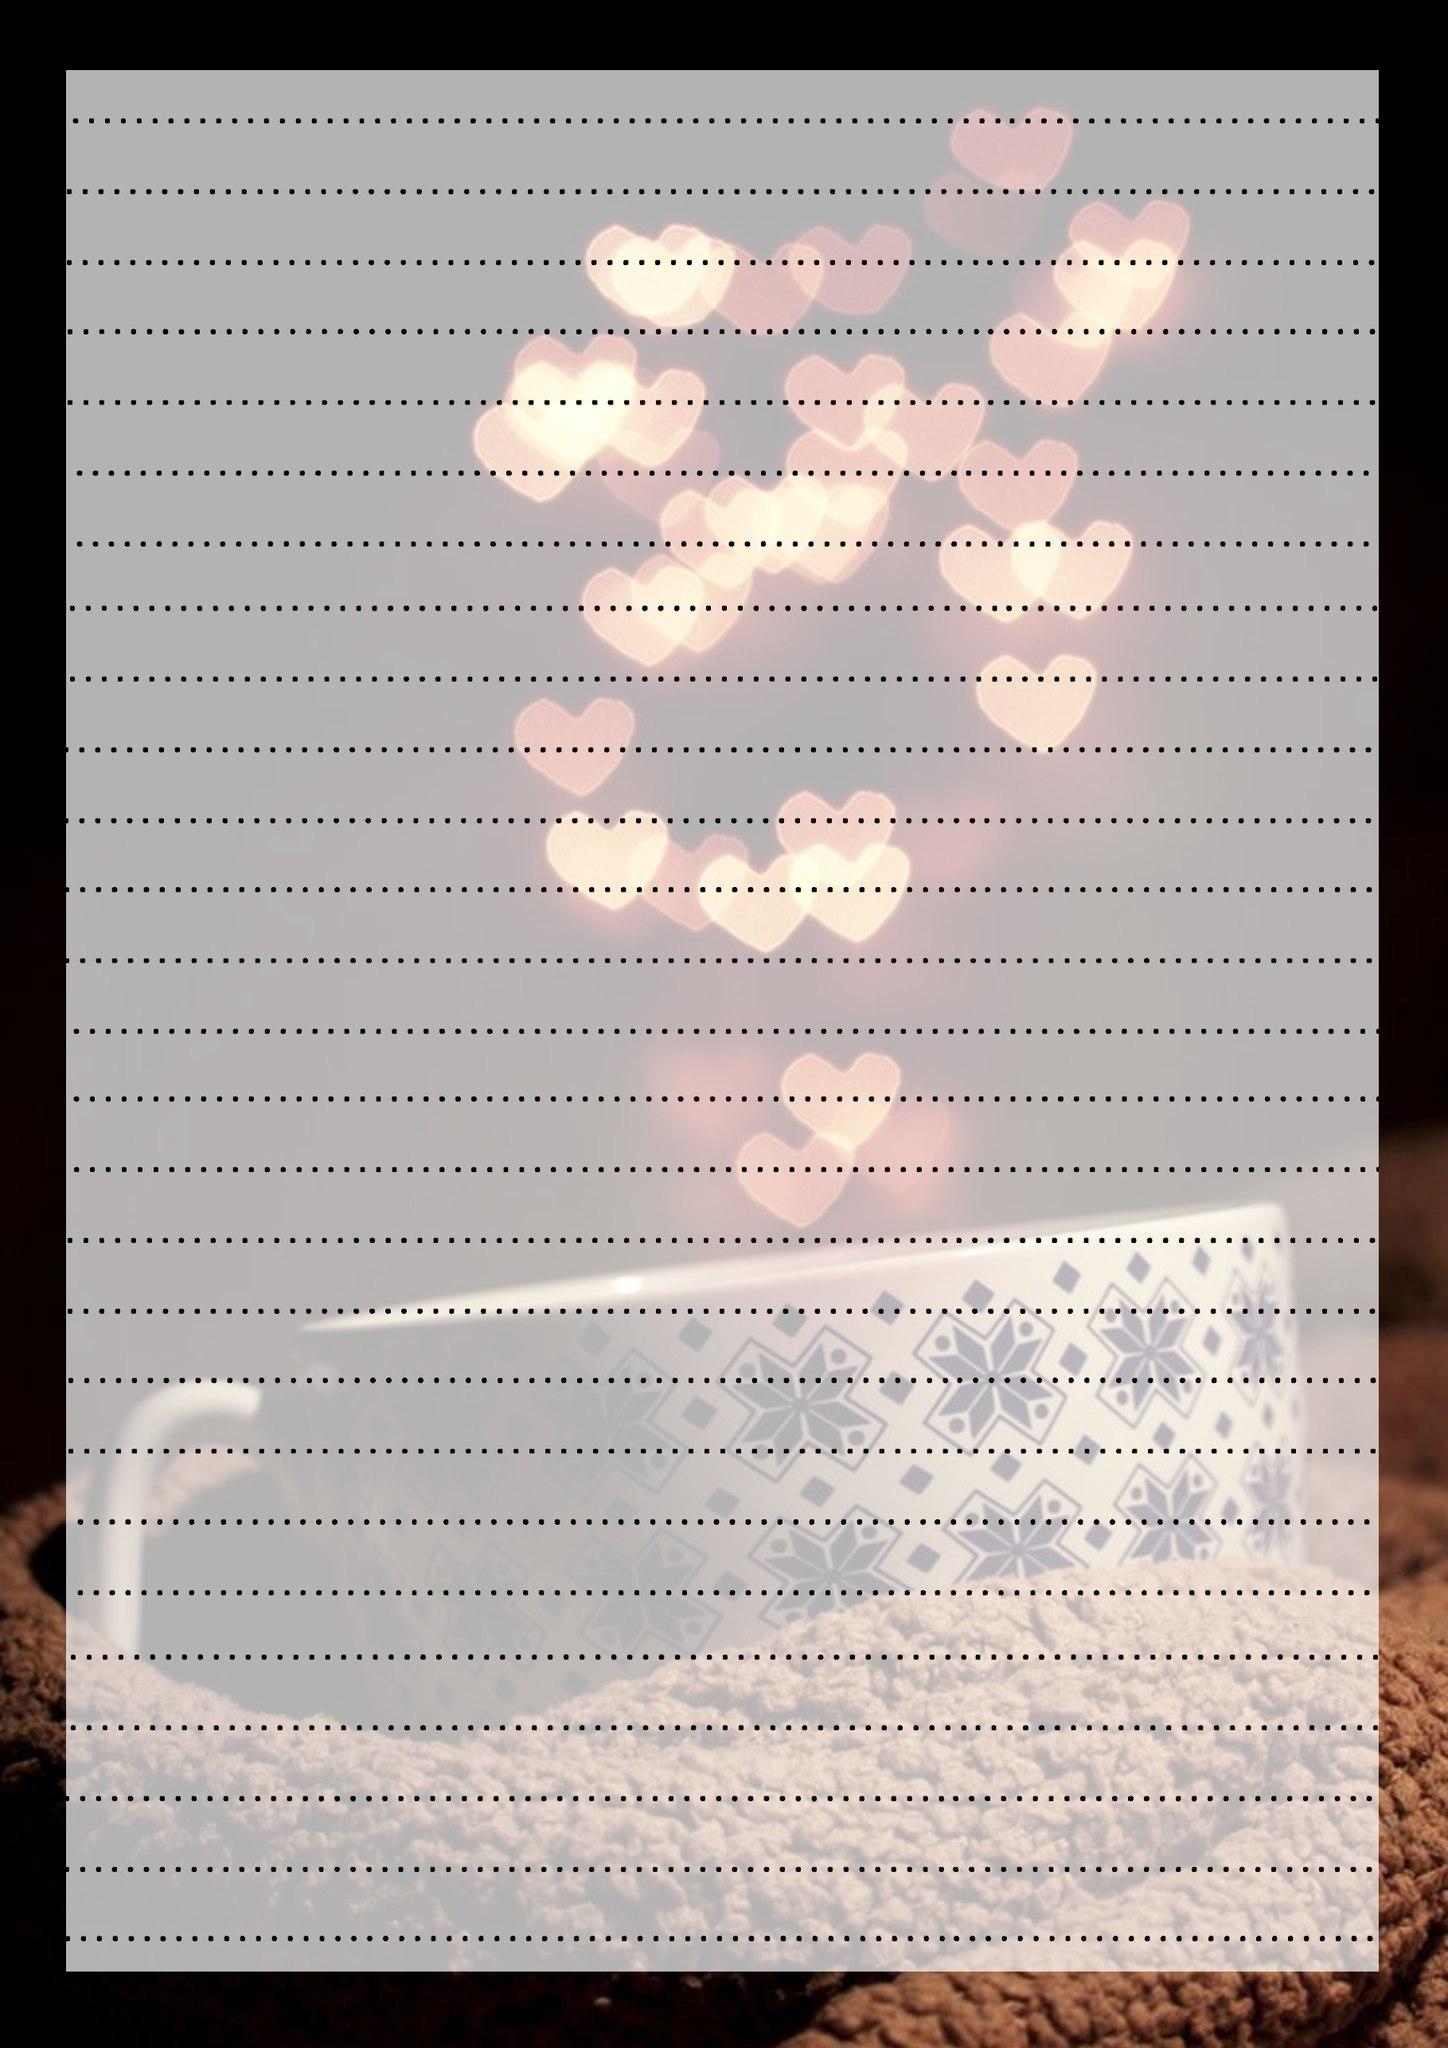 Шаблон письма с чашкой и сердечками